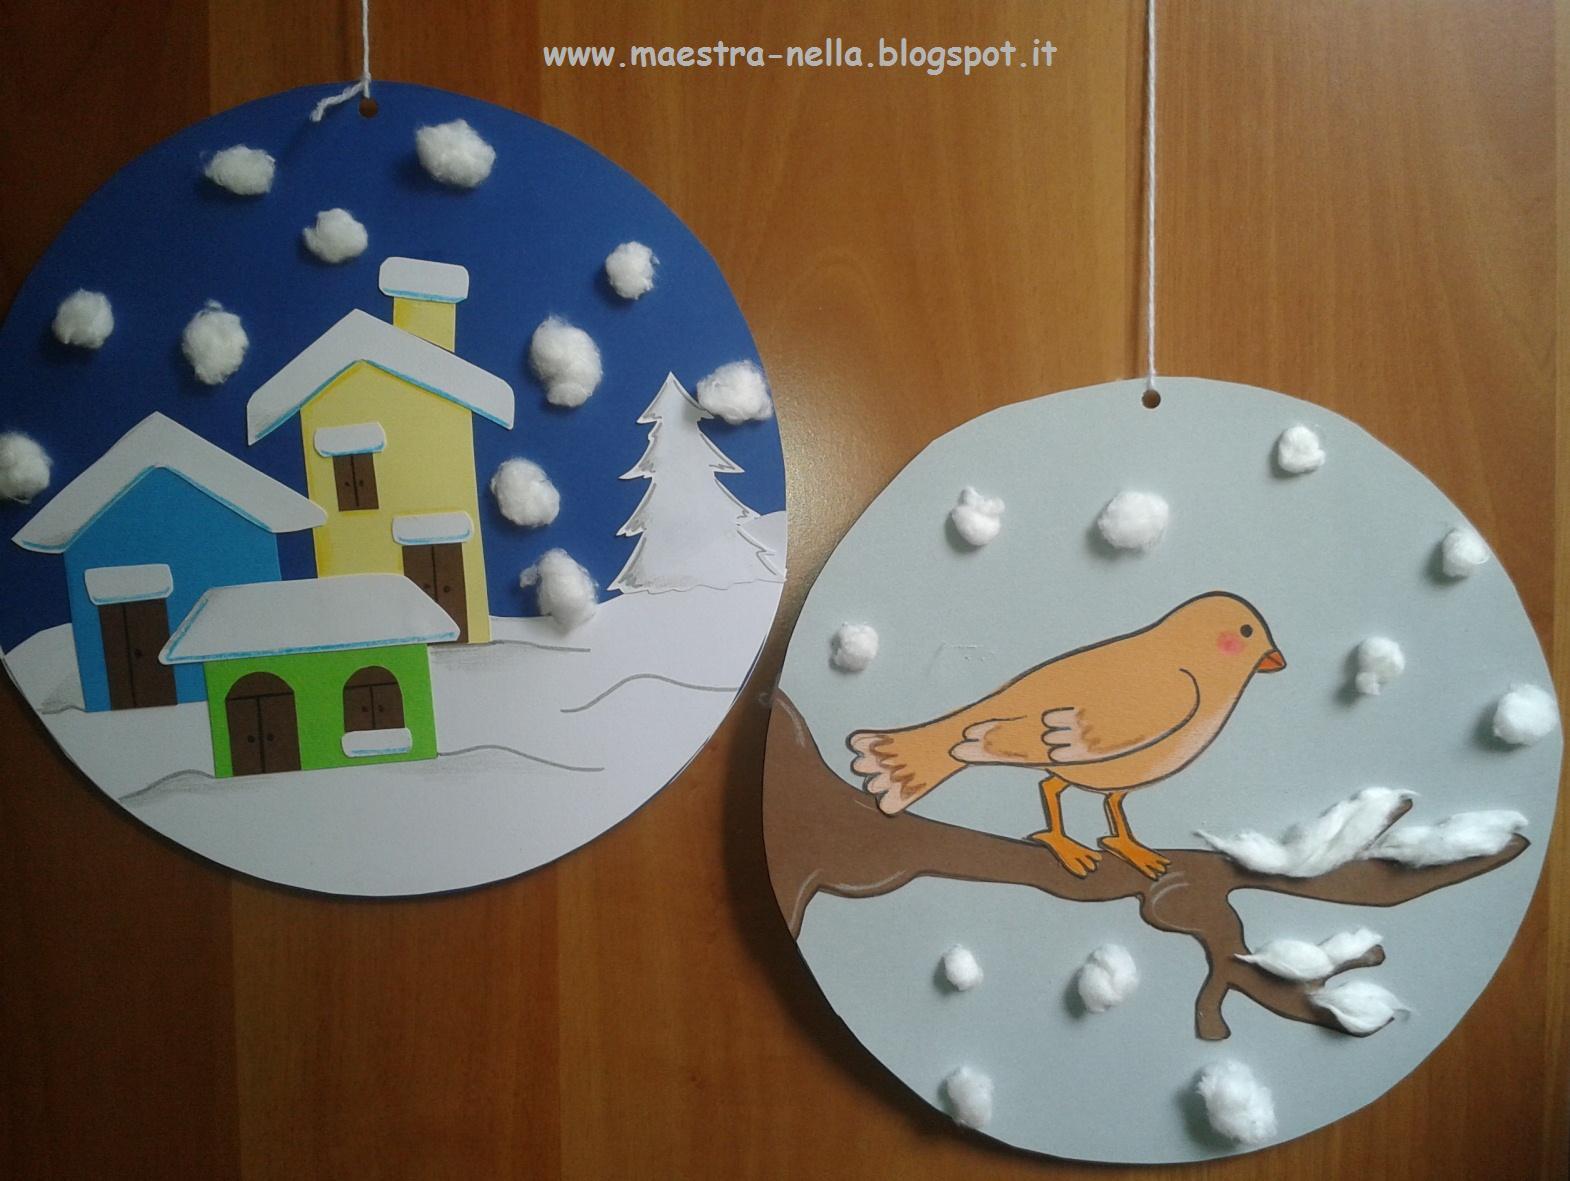 Maestra nella addobbi invernali for Addobbi aula natale